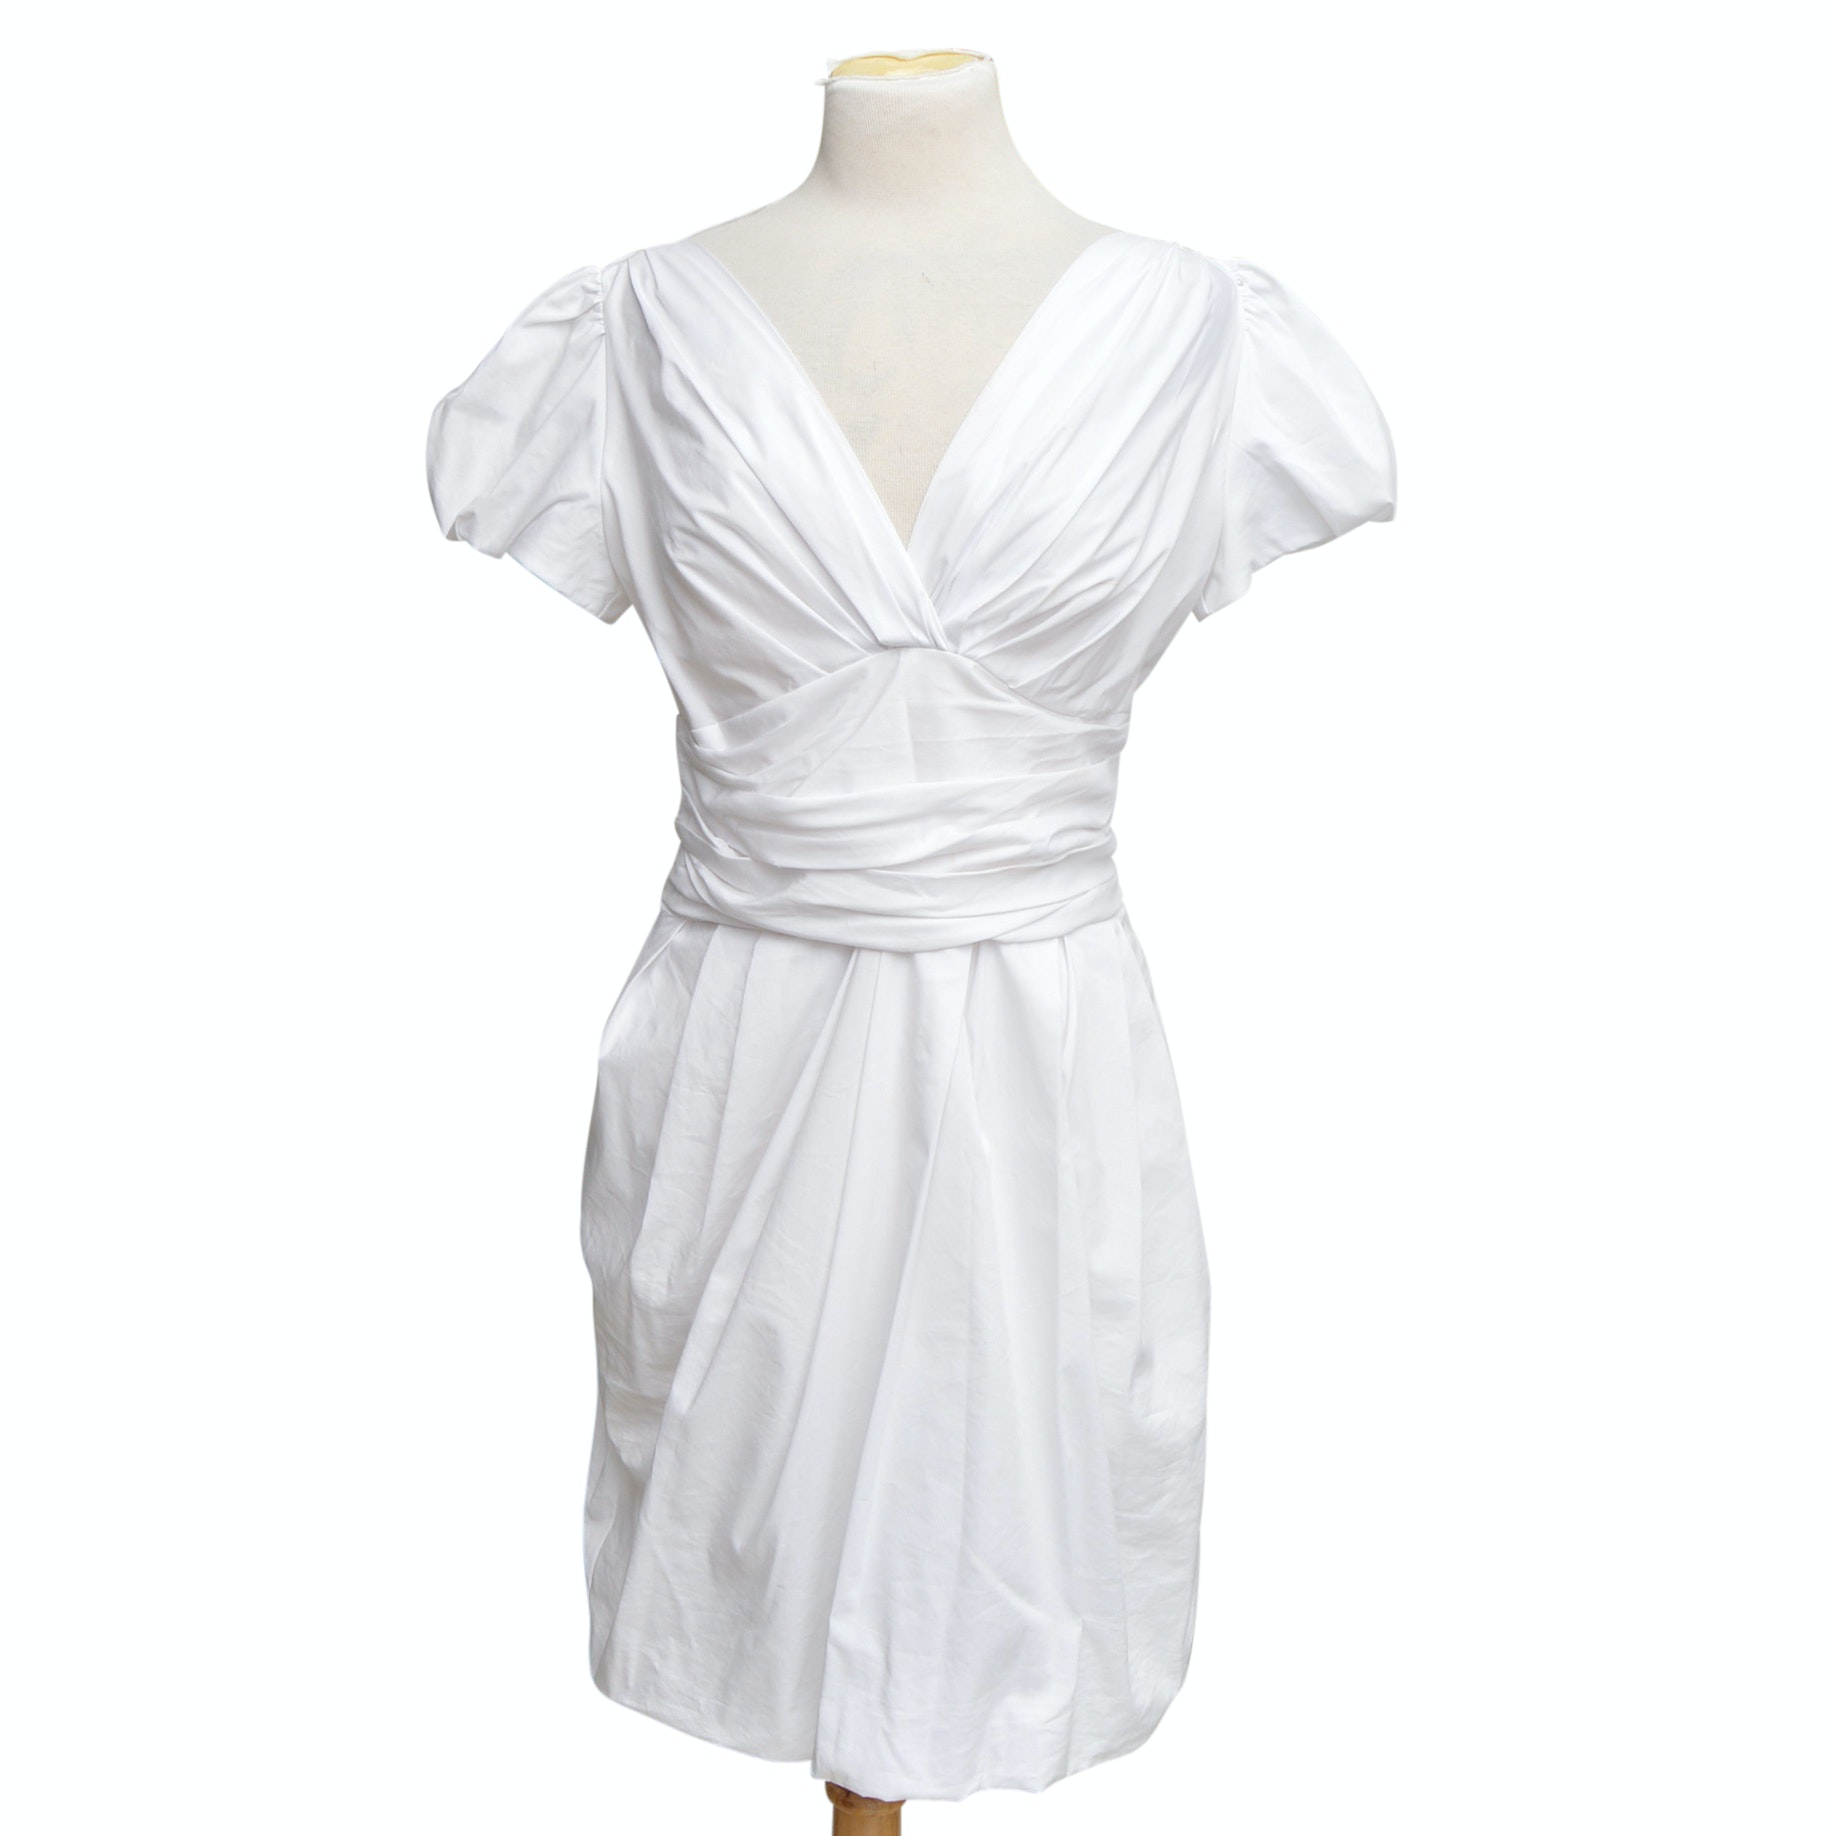 Women's Moschino Cheap and Chic Dress